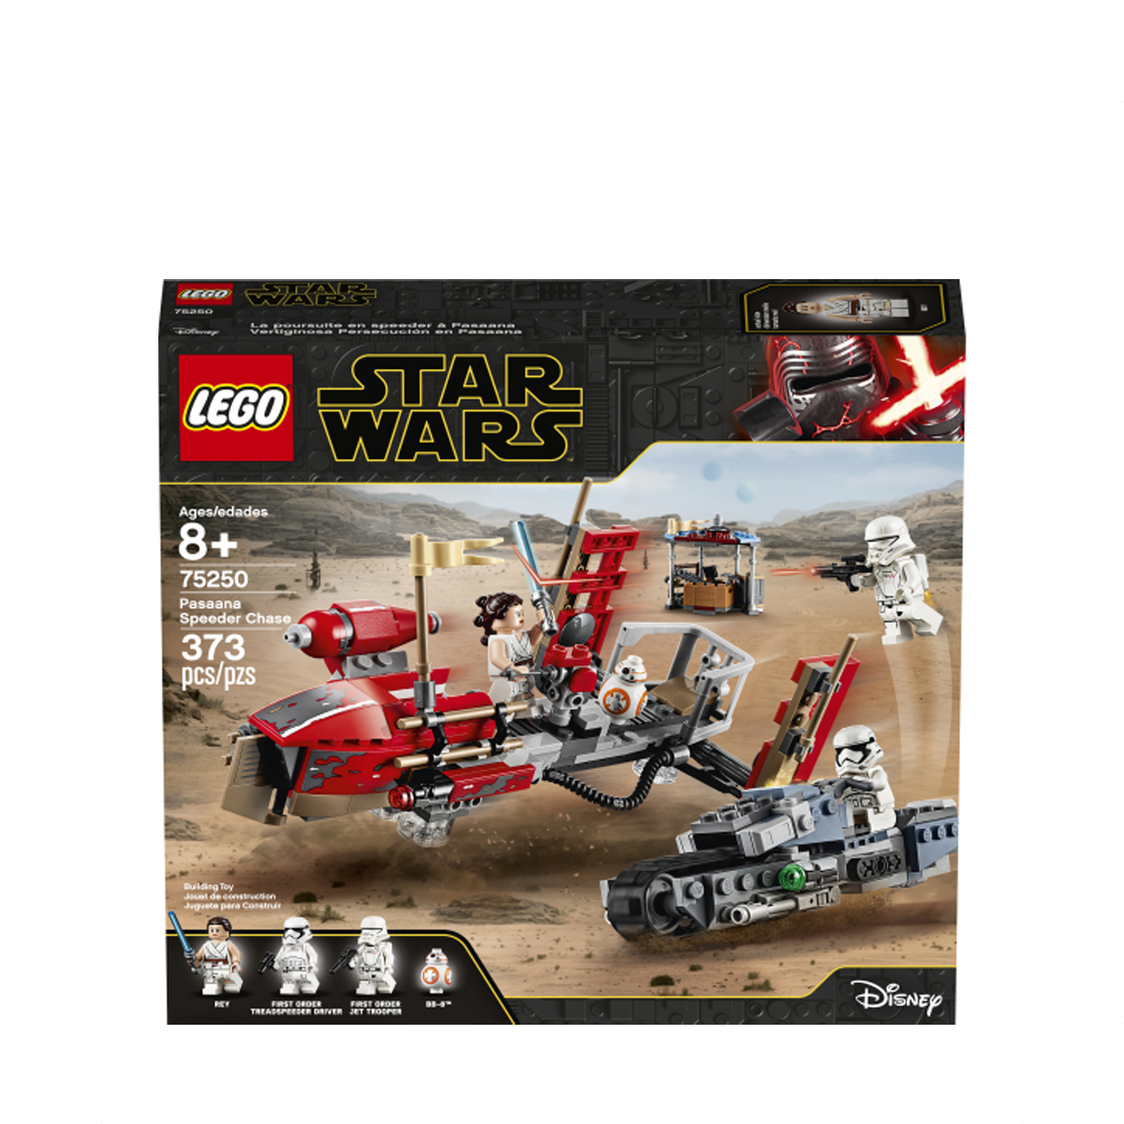 LEGO Star Wars - Pasaana Speeder Chase 75250 V29